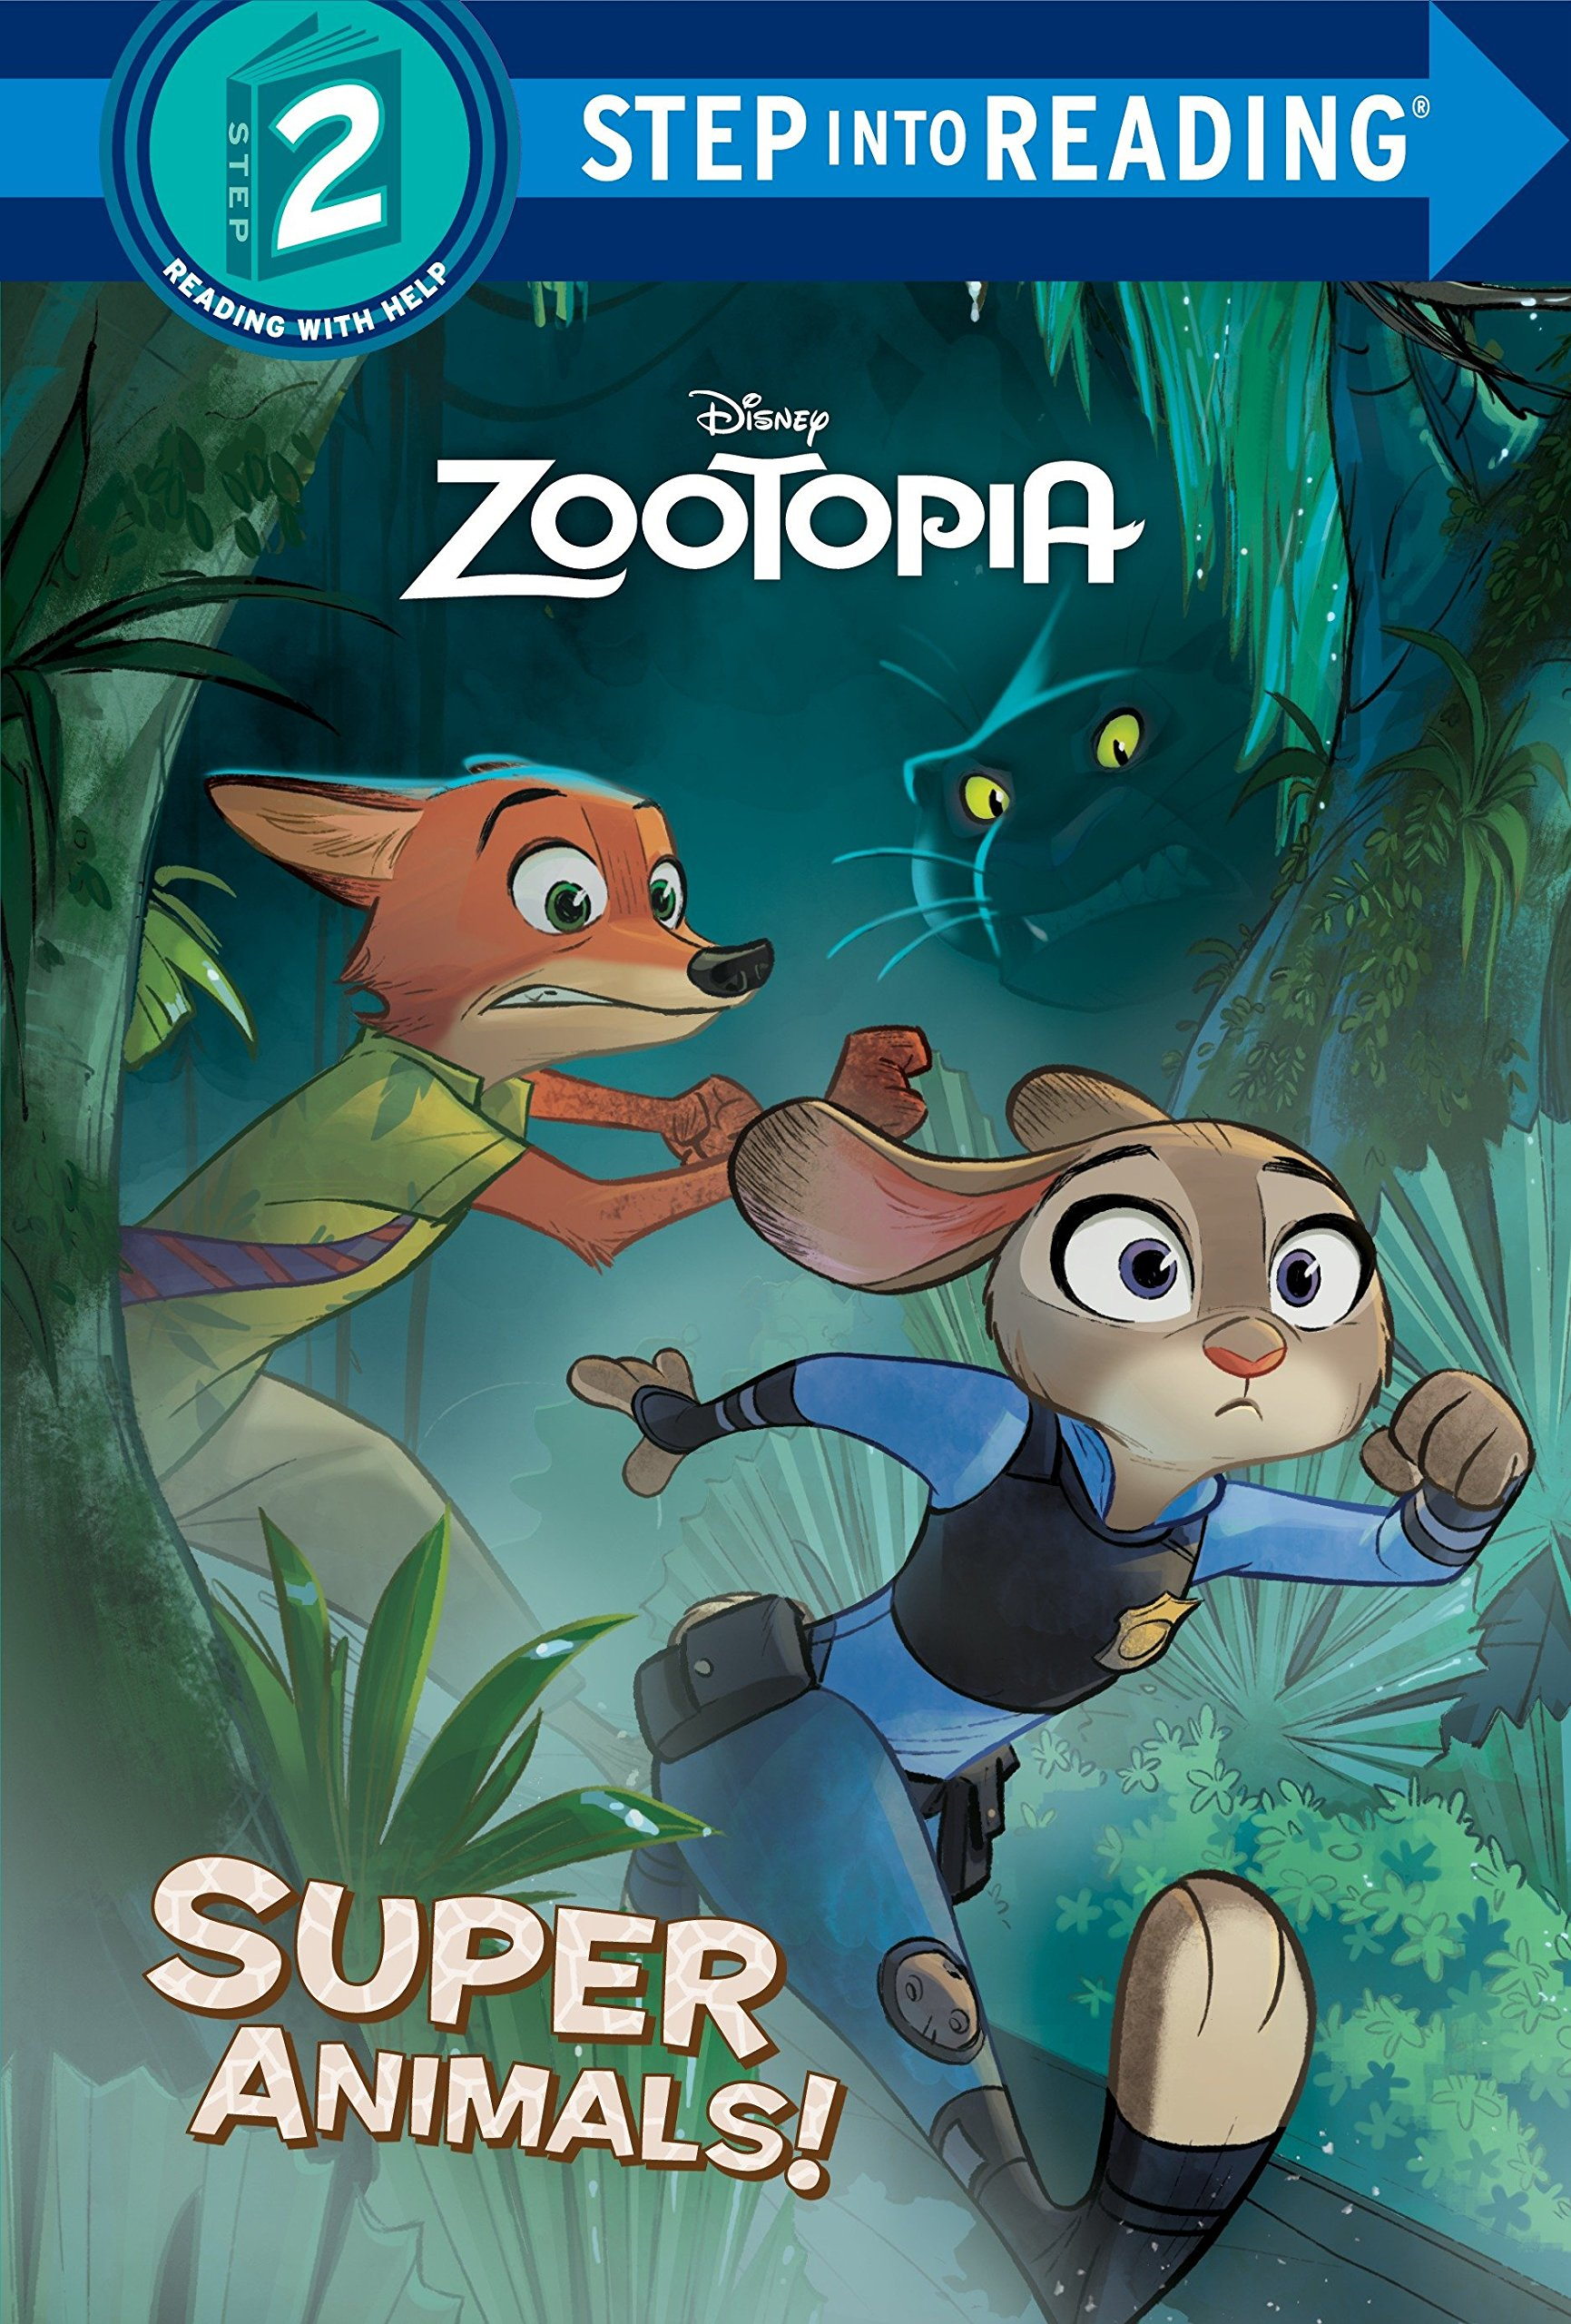 Super Animals! (Disney Zootopia) (Step into Reading) ebook